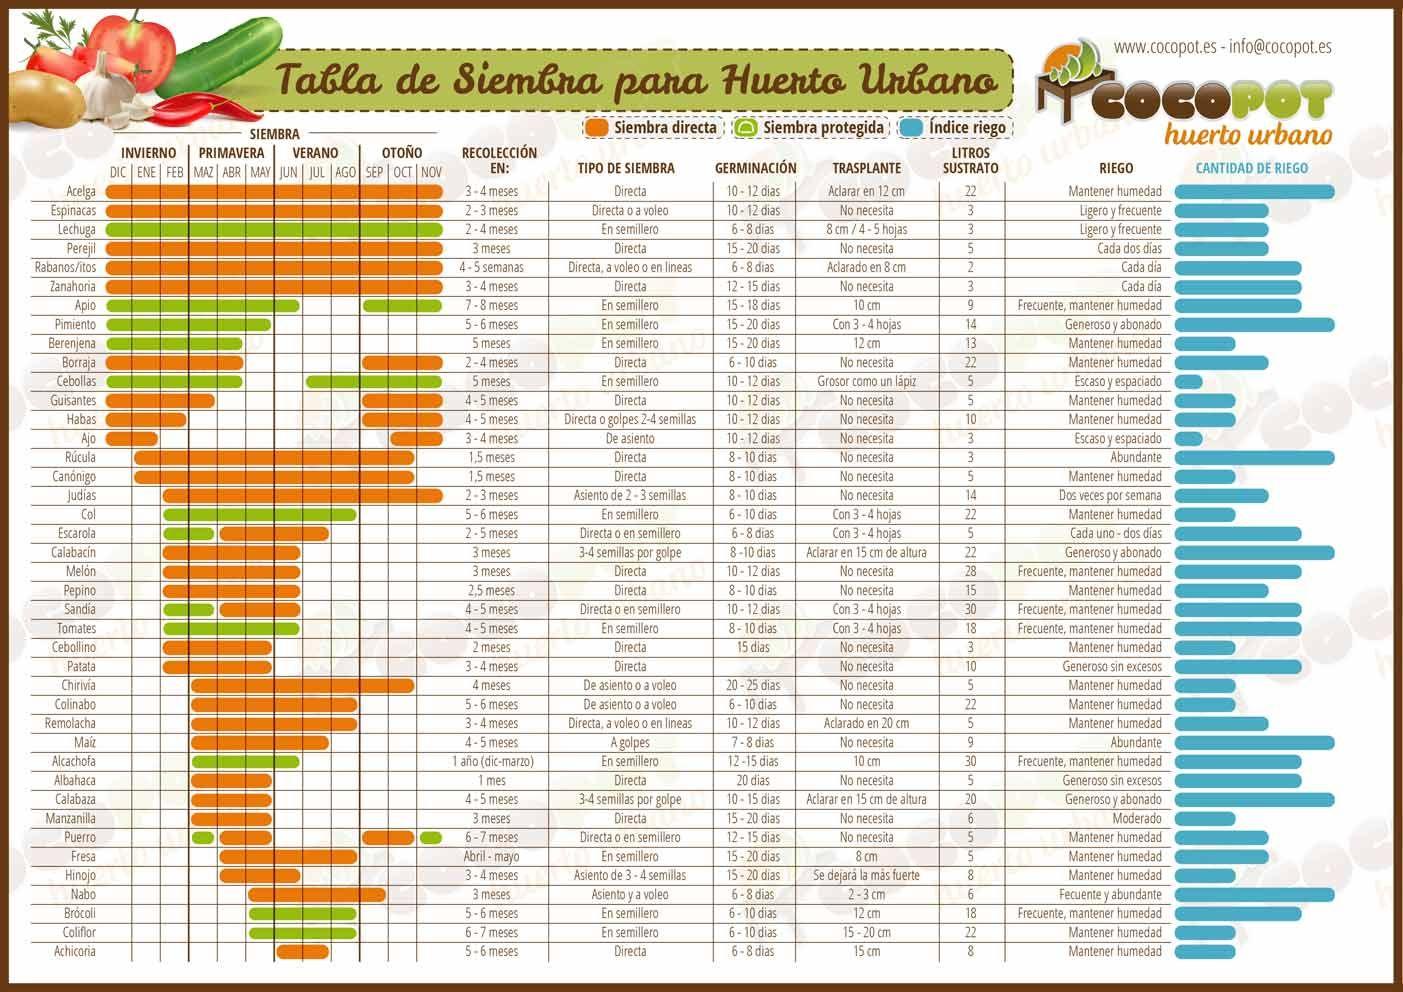 Tabla de siembra para huerto urbano calendario de la - Huerto de urbano ...